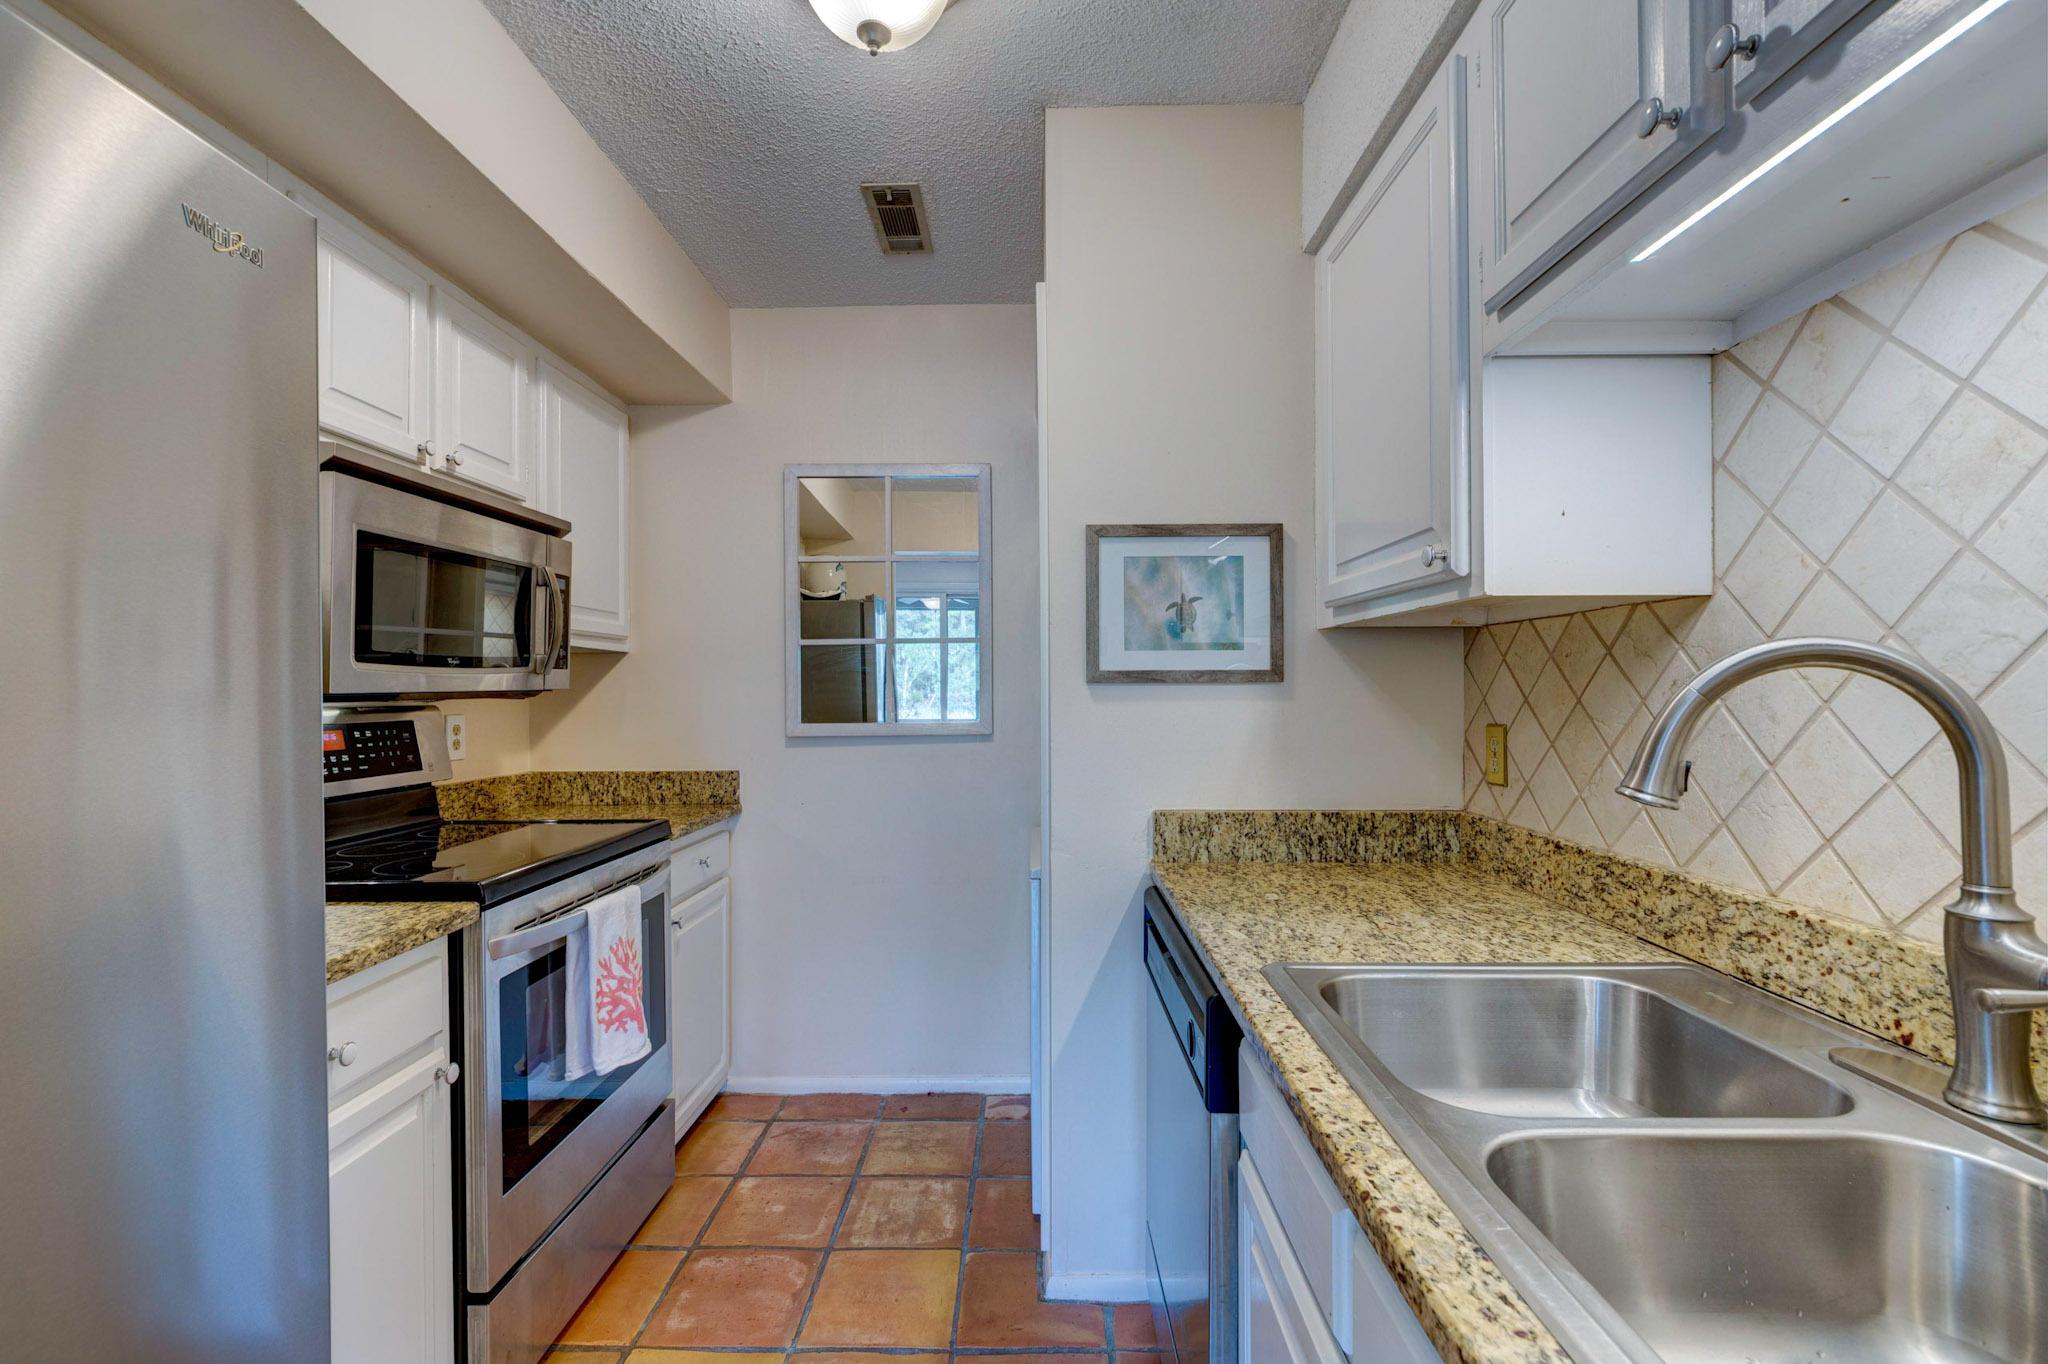 Creek Watch Villas Homes For Sale - 1244 Creek Watch, Johns Island, SC - 6